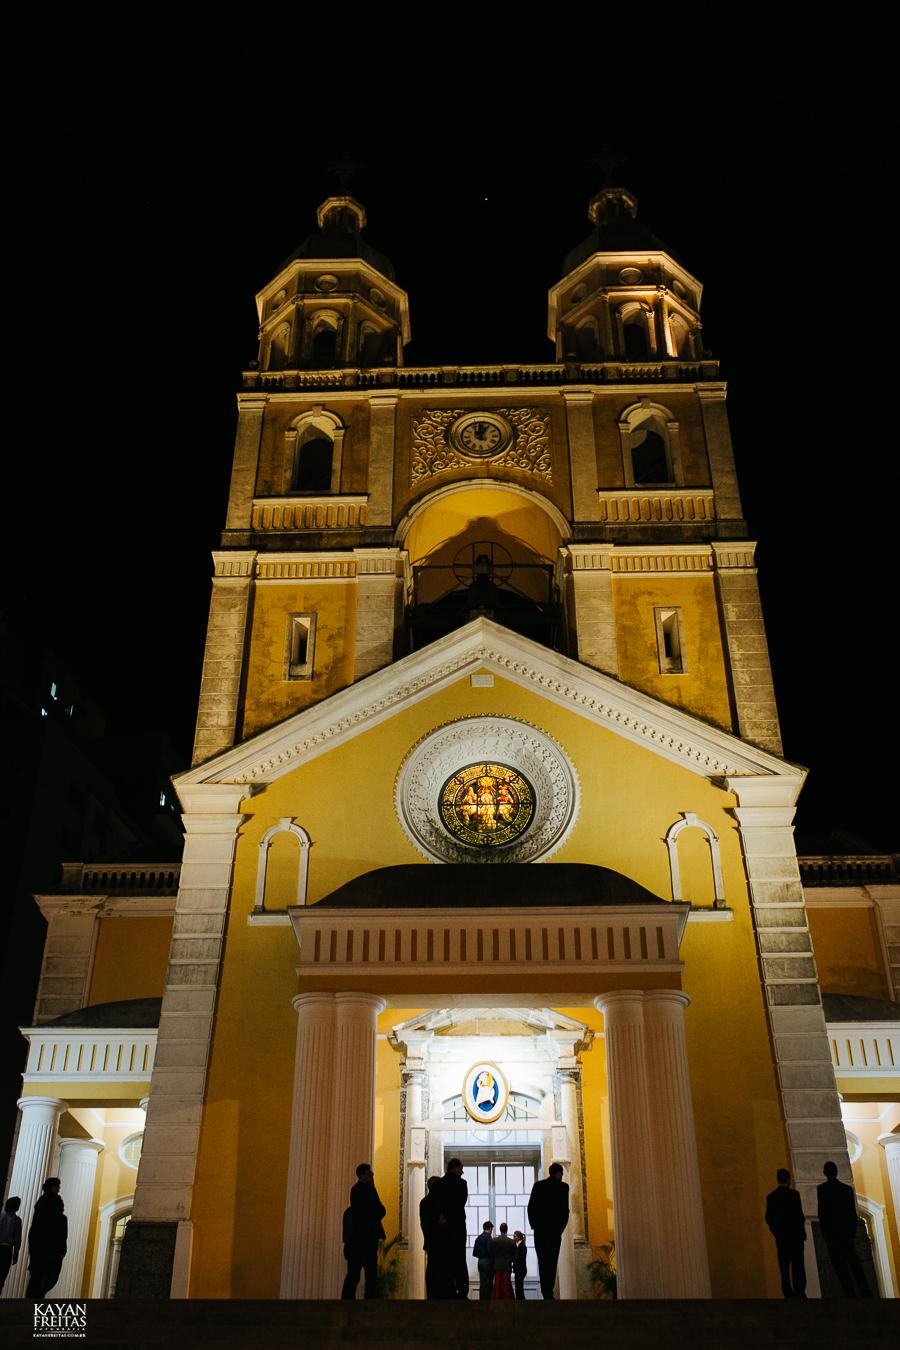 casamento-catedral-pea-0054 Casamento em Florianópolis - Priscilla e Anderson - Veleiros da Ilha